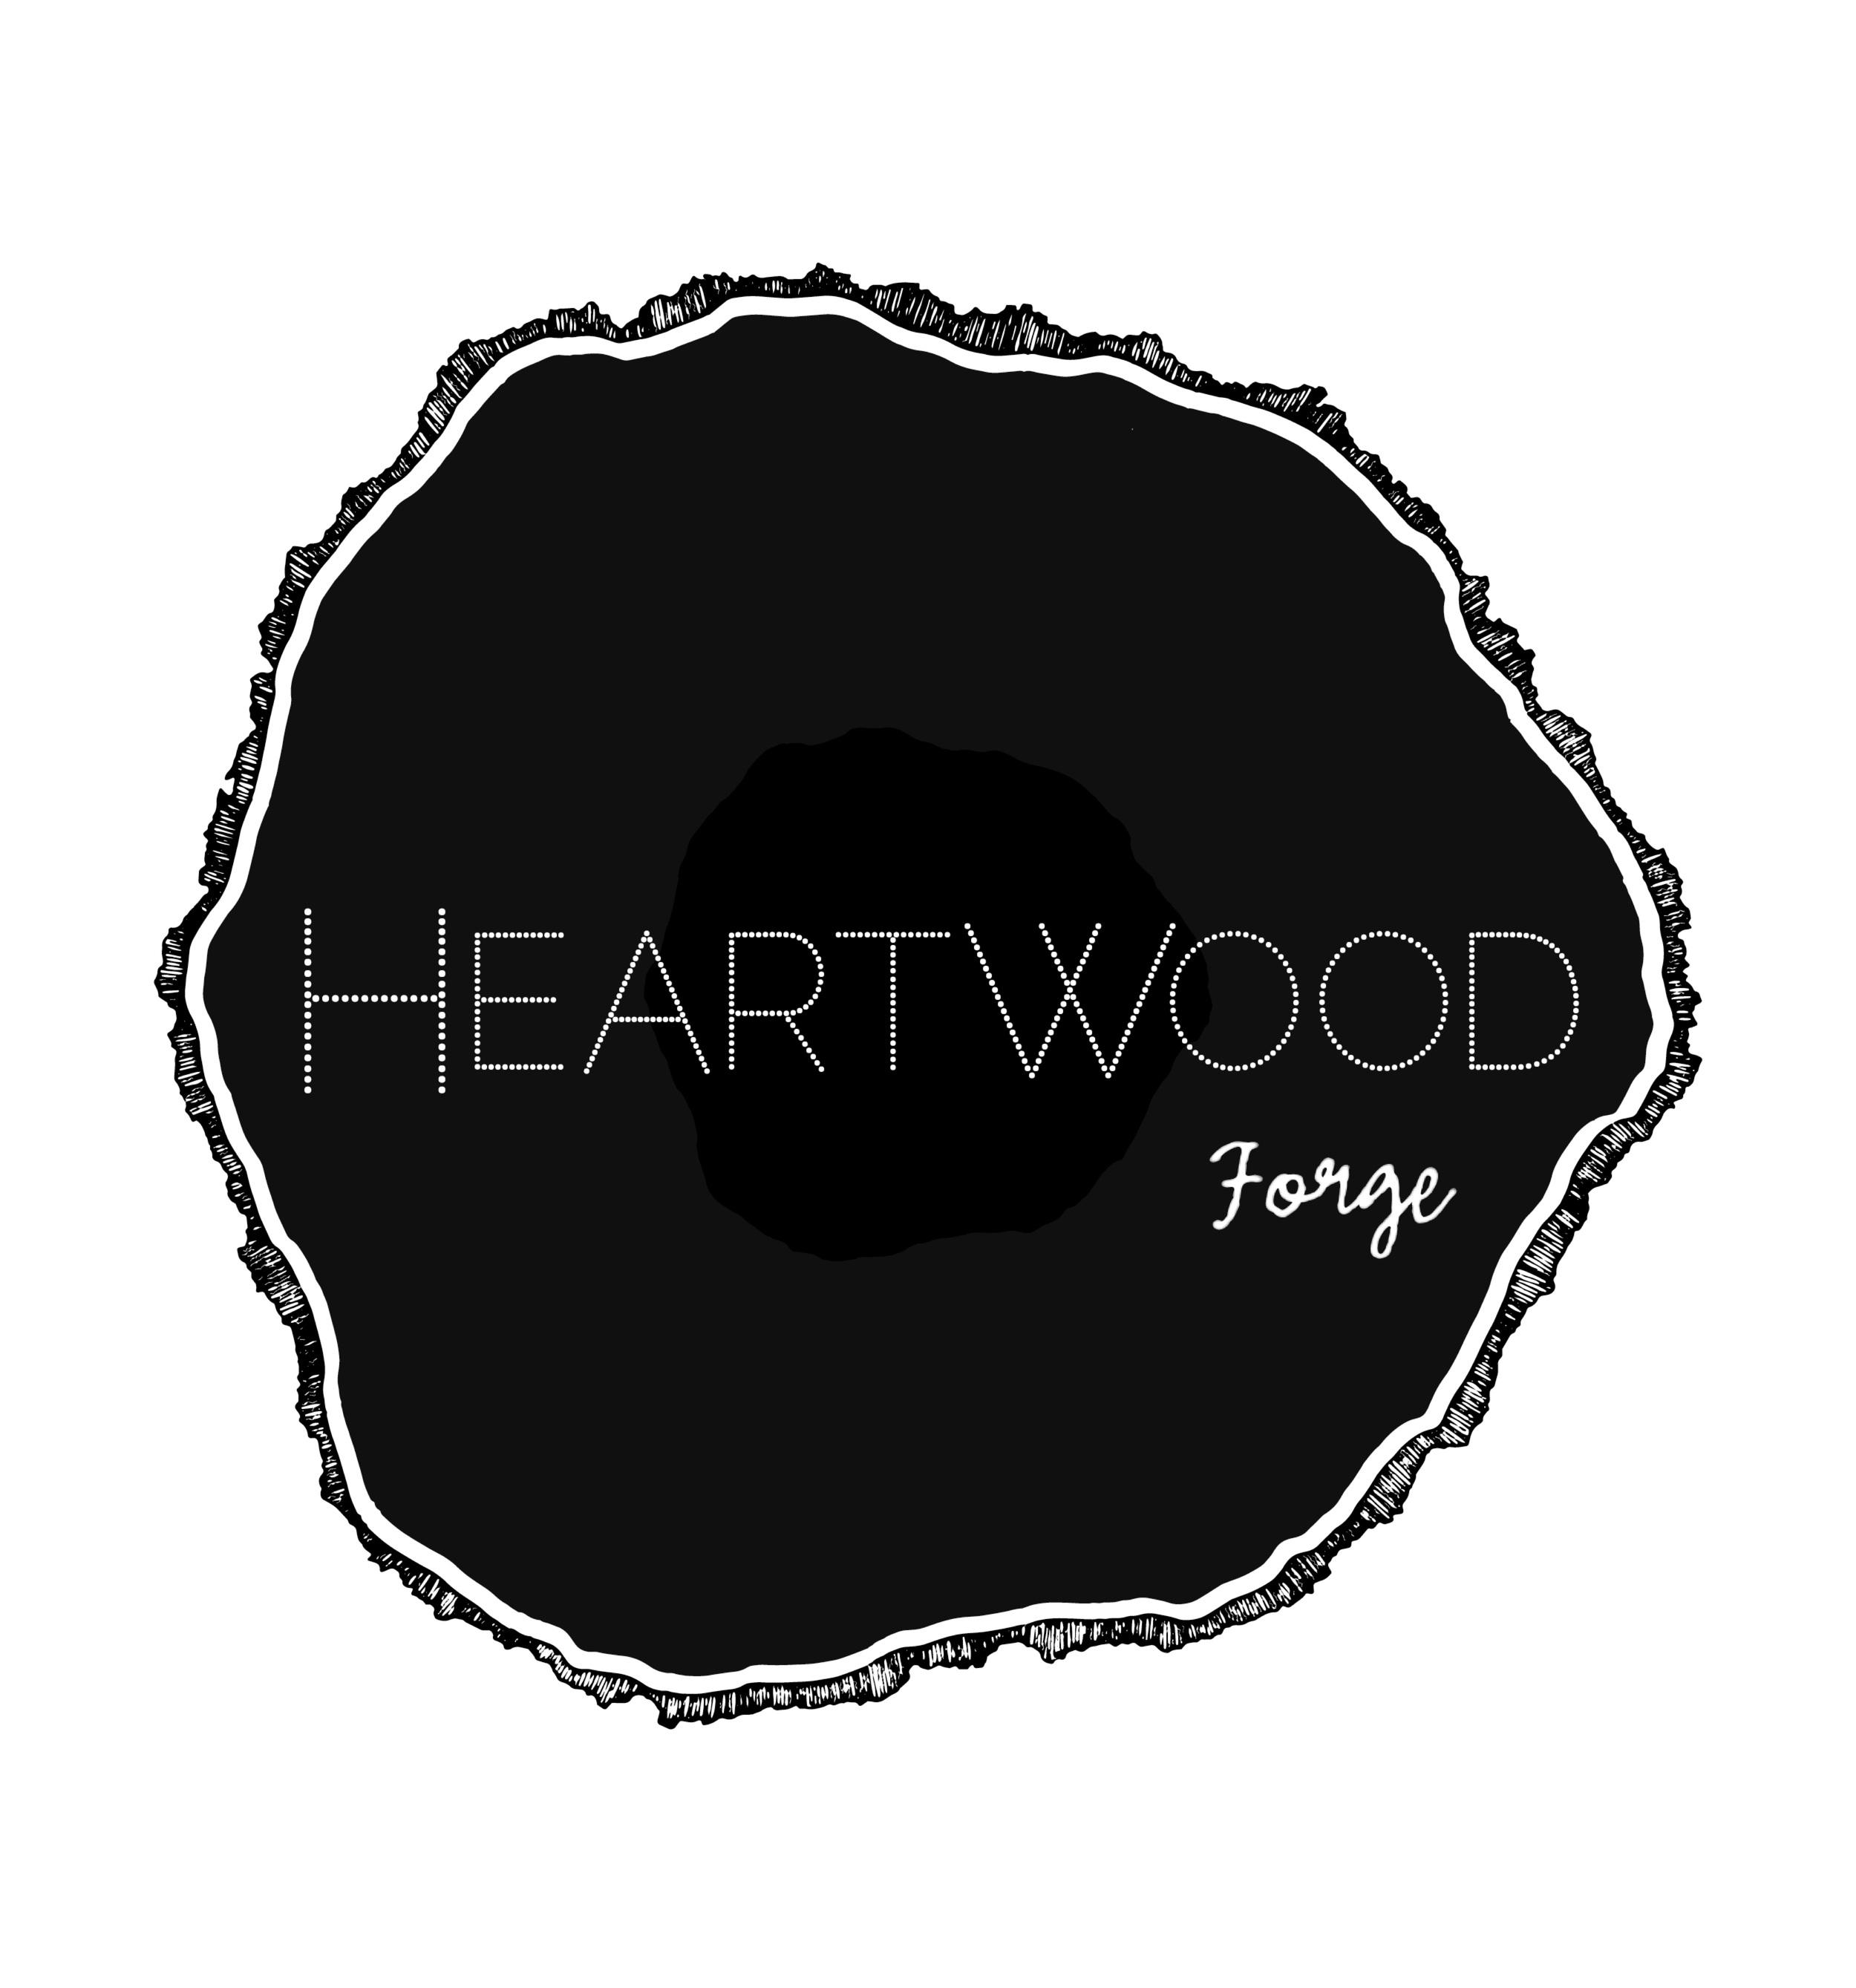 Heartwood_forge_rnd2.jpg